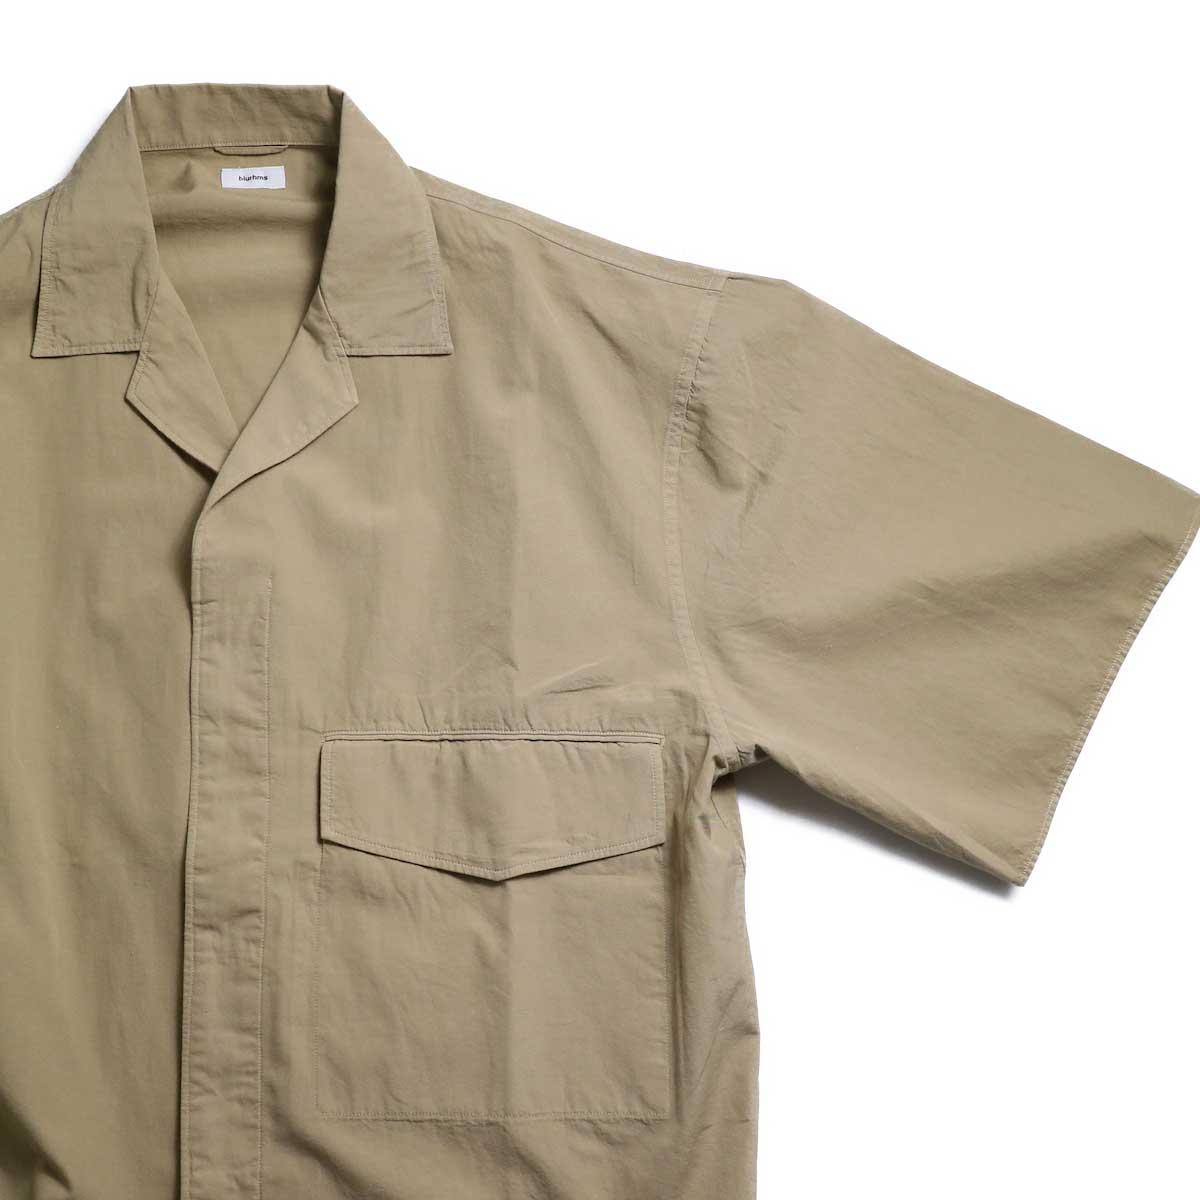 blurhms / Polish Chambray Wide Sleeve Box Shirt -Beige フラップポケット、比翼